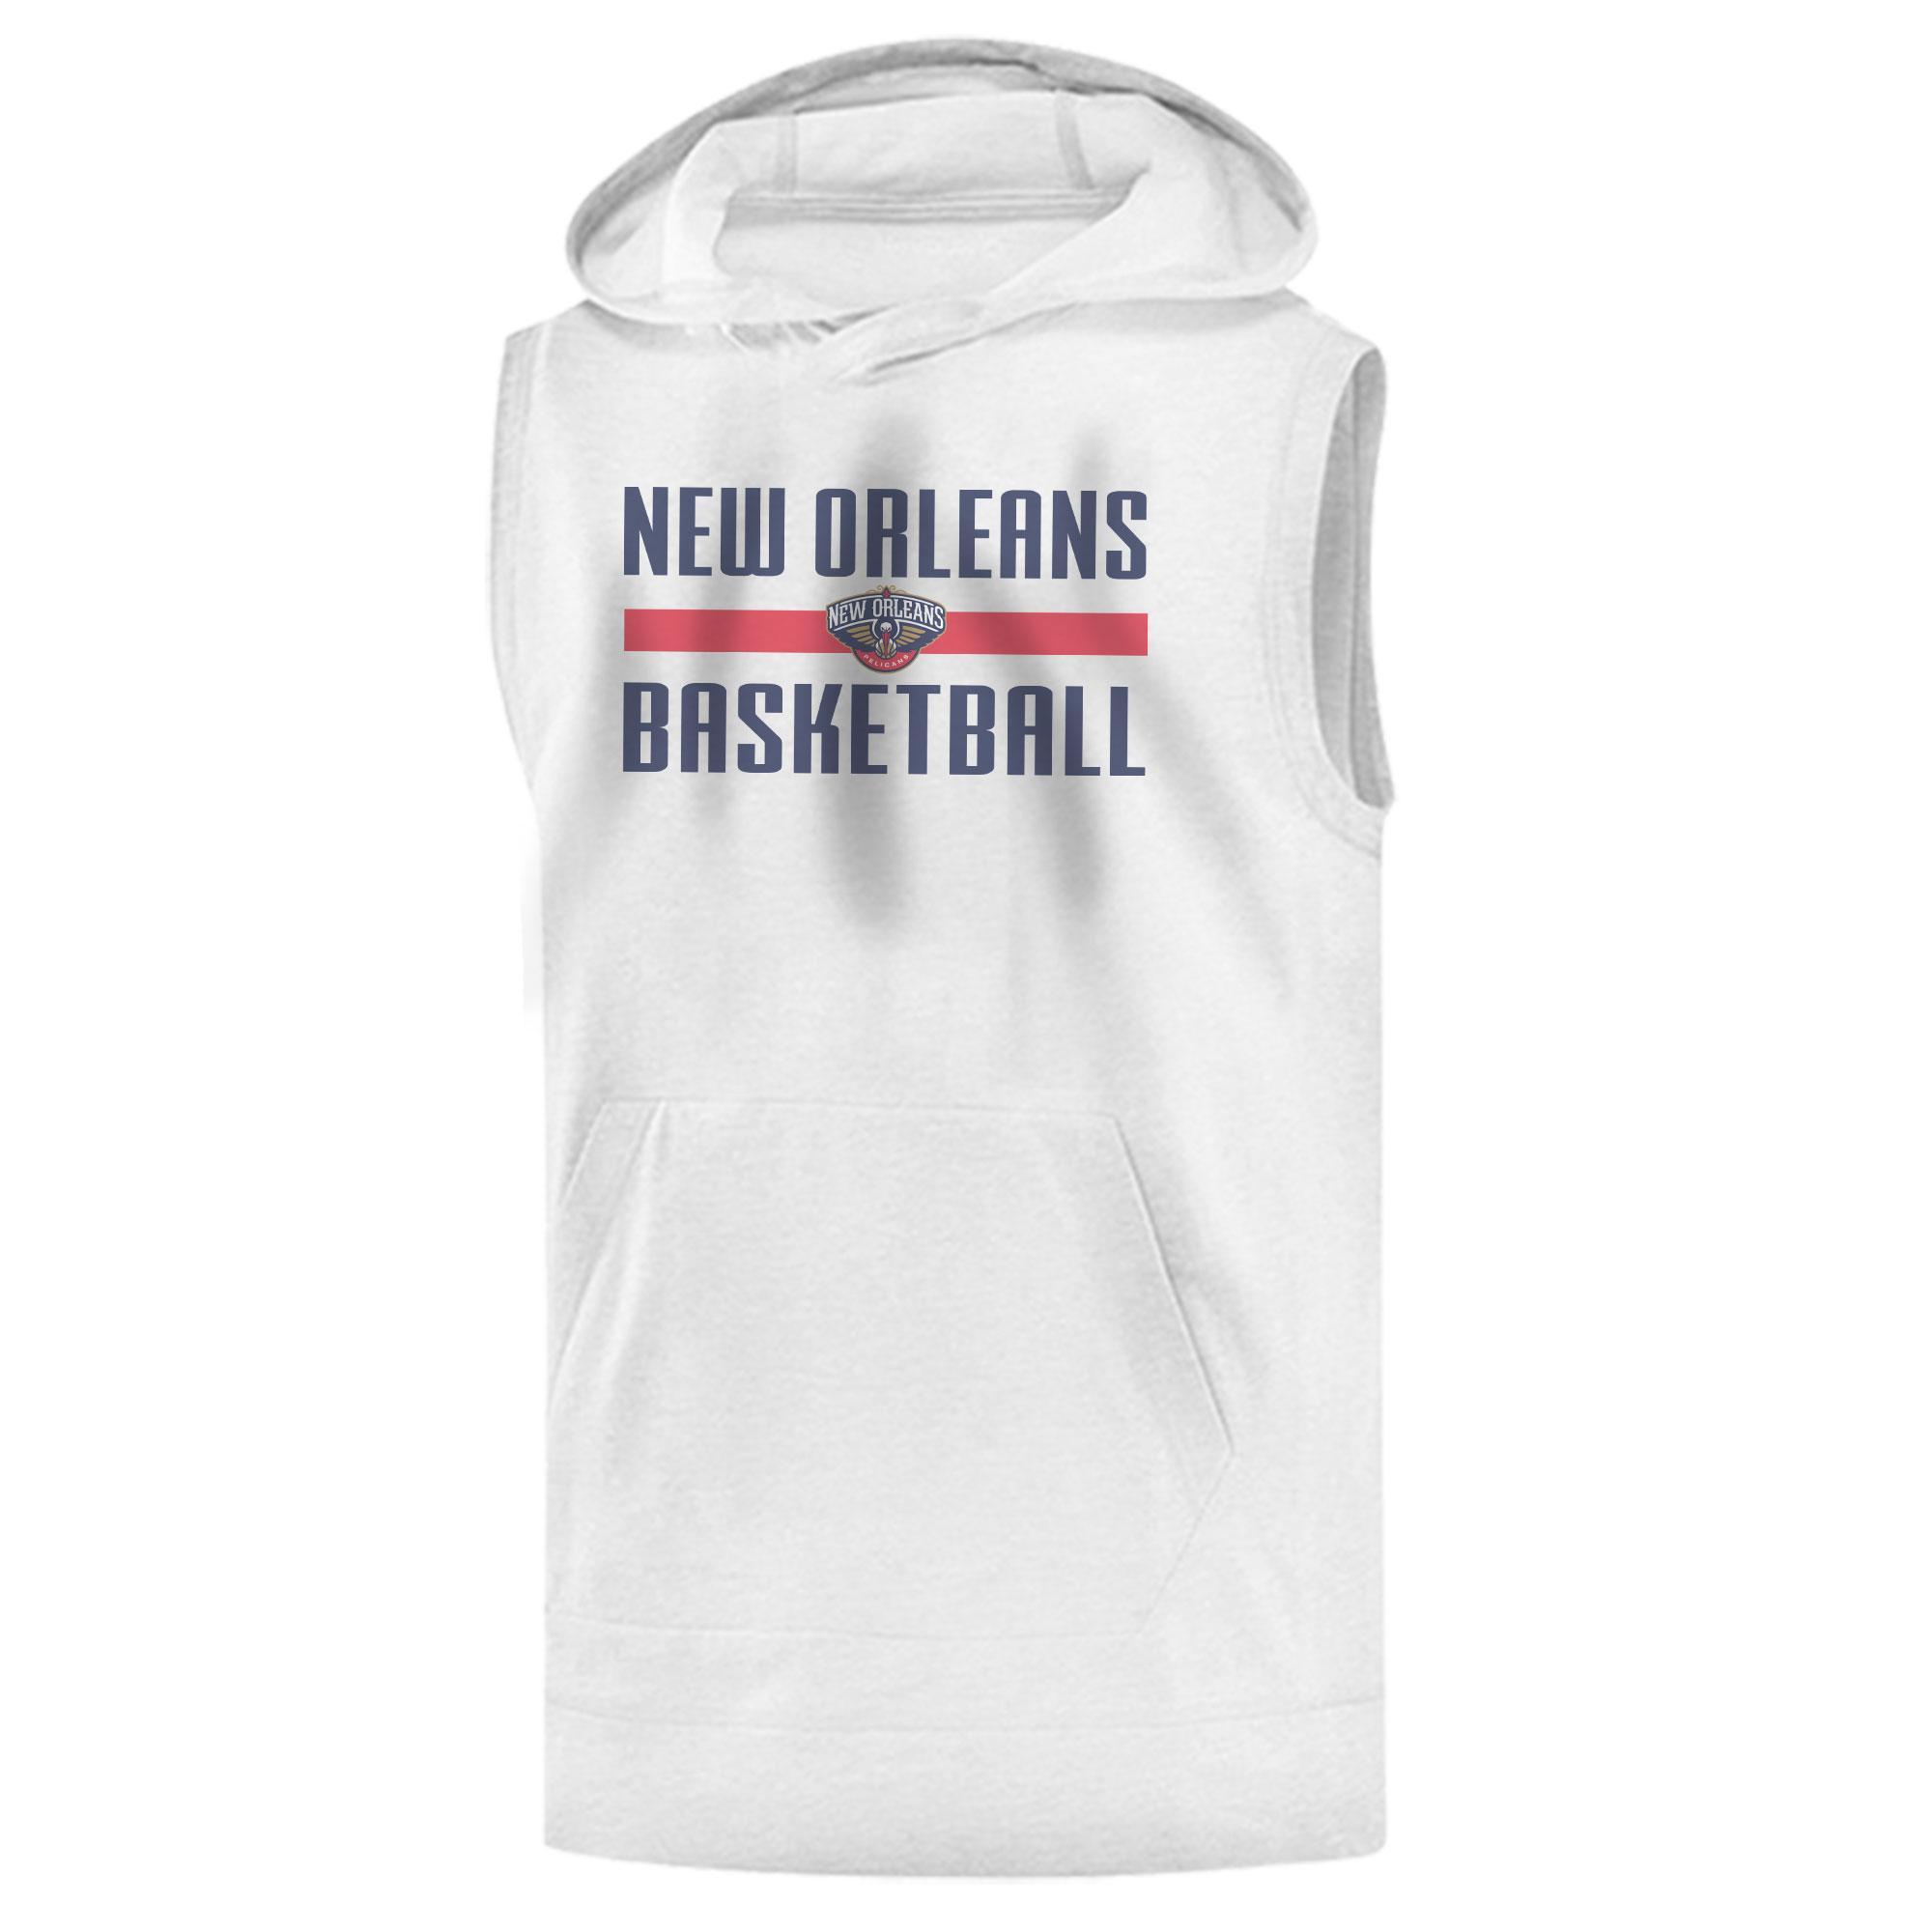 New Orleans Basketball Sleeveless (KLS-GRY-NP-orlns.bsktbll-530)